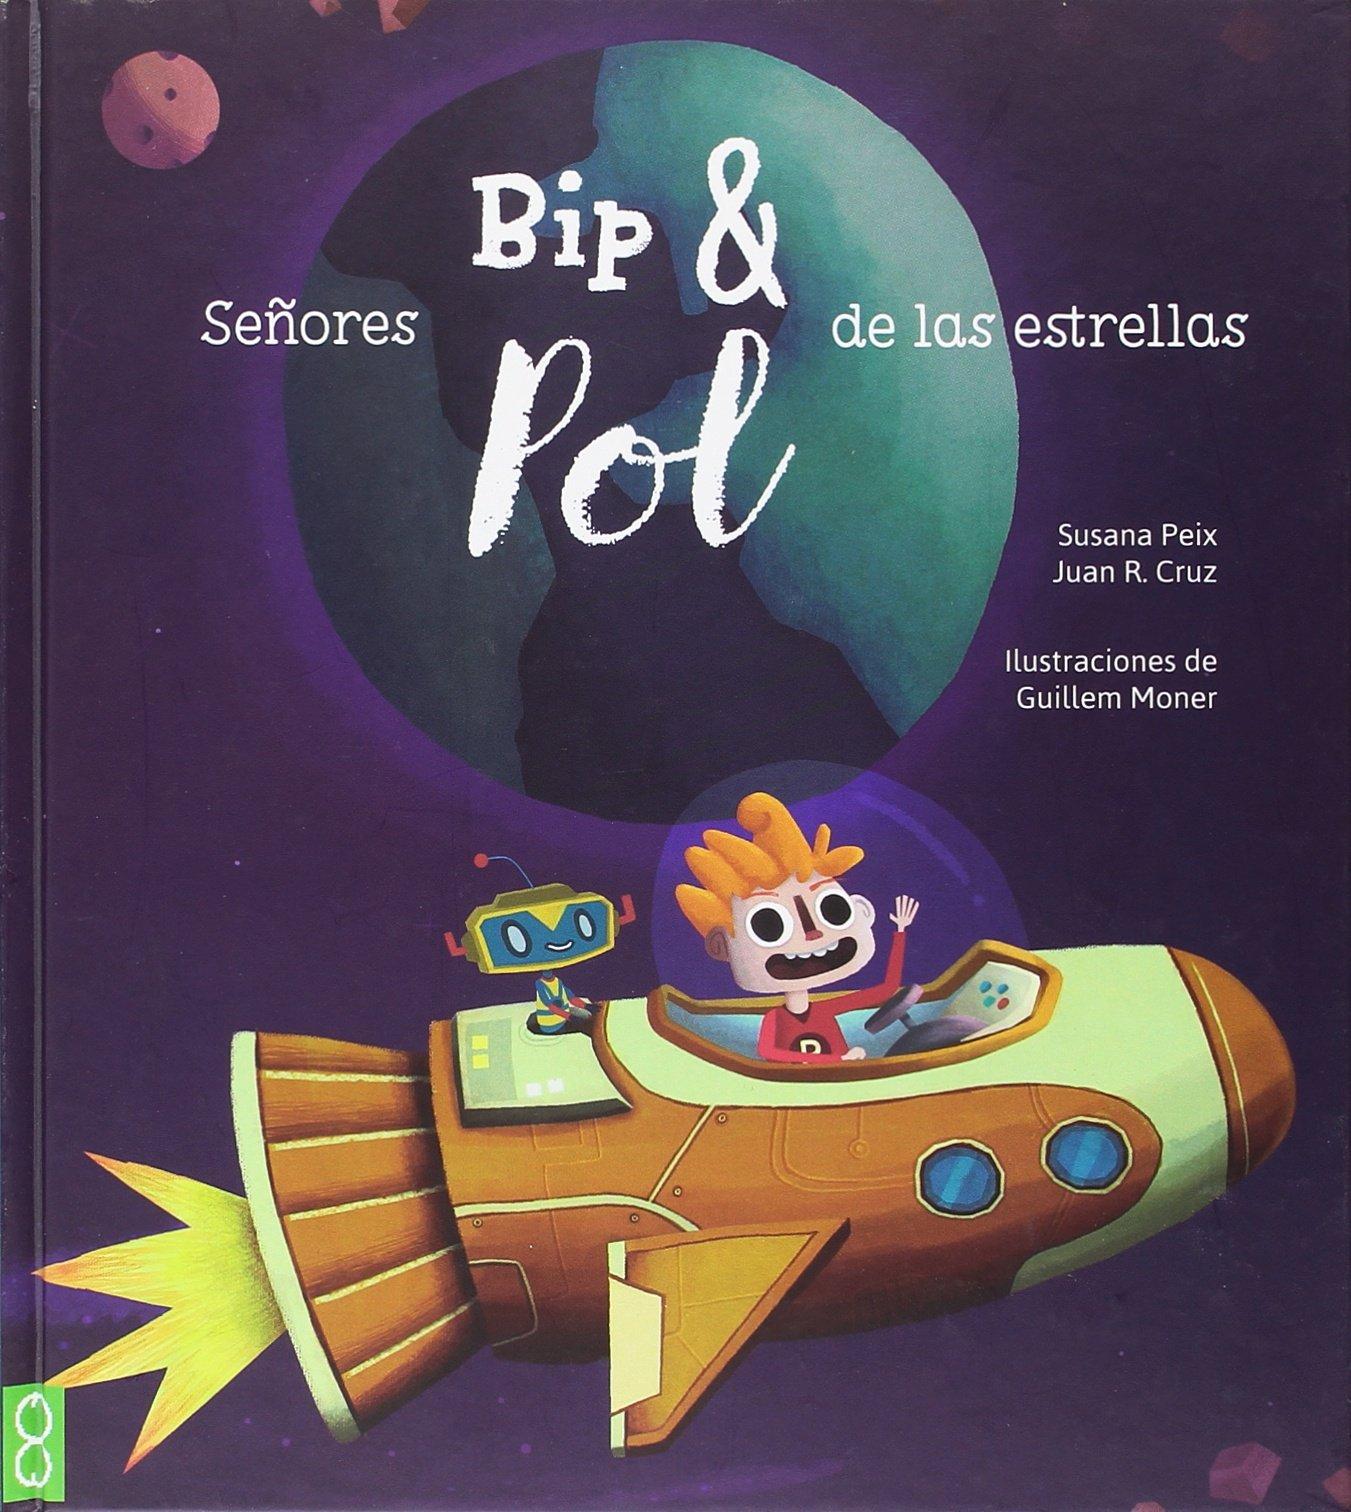 Bip & Pol (Spanish) Paperback – January 1, 1900